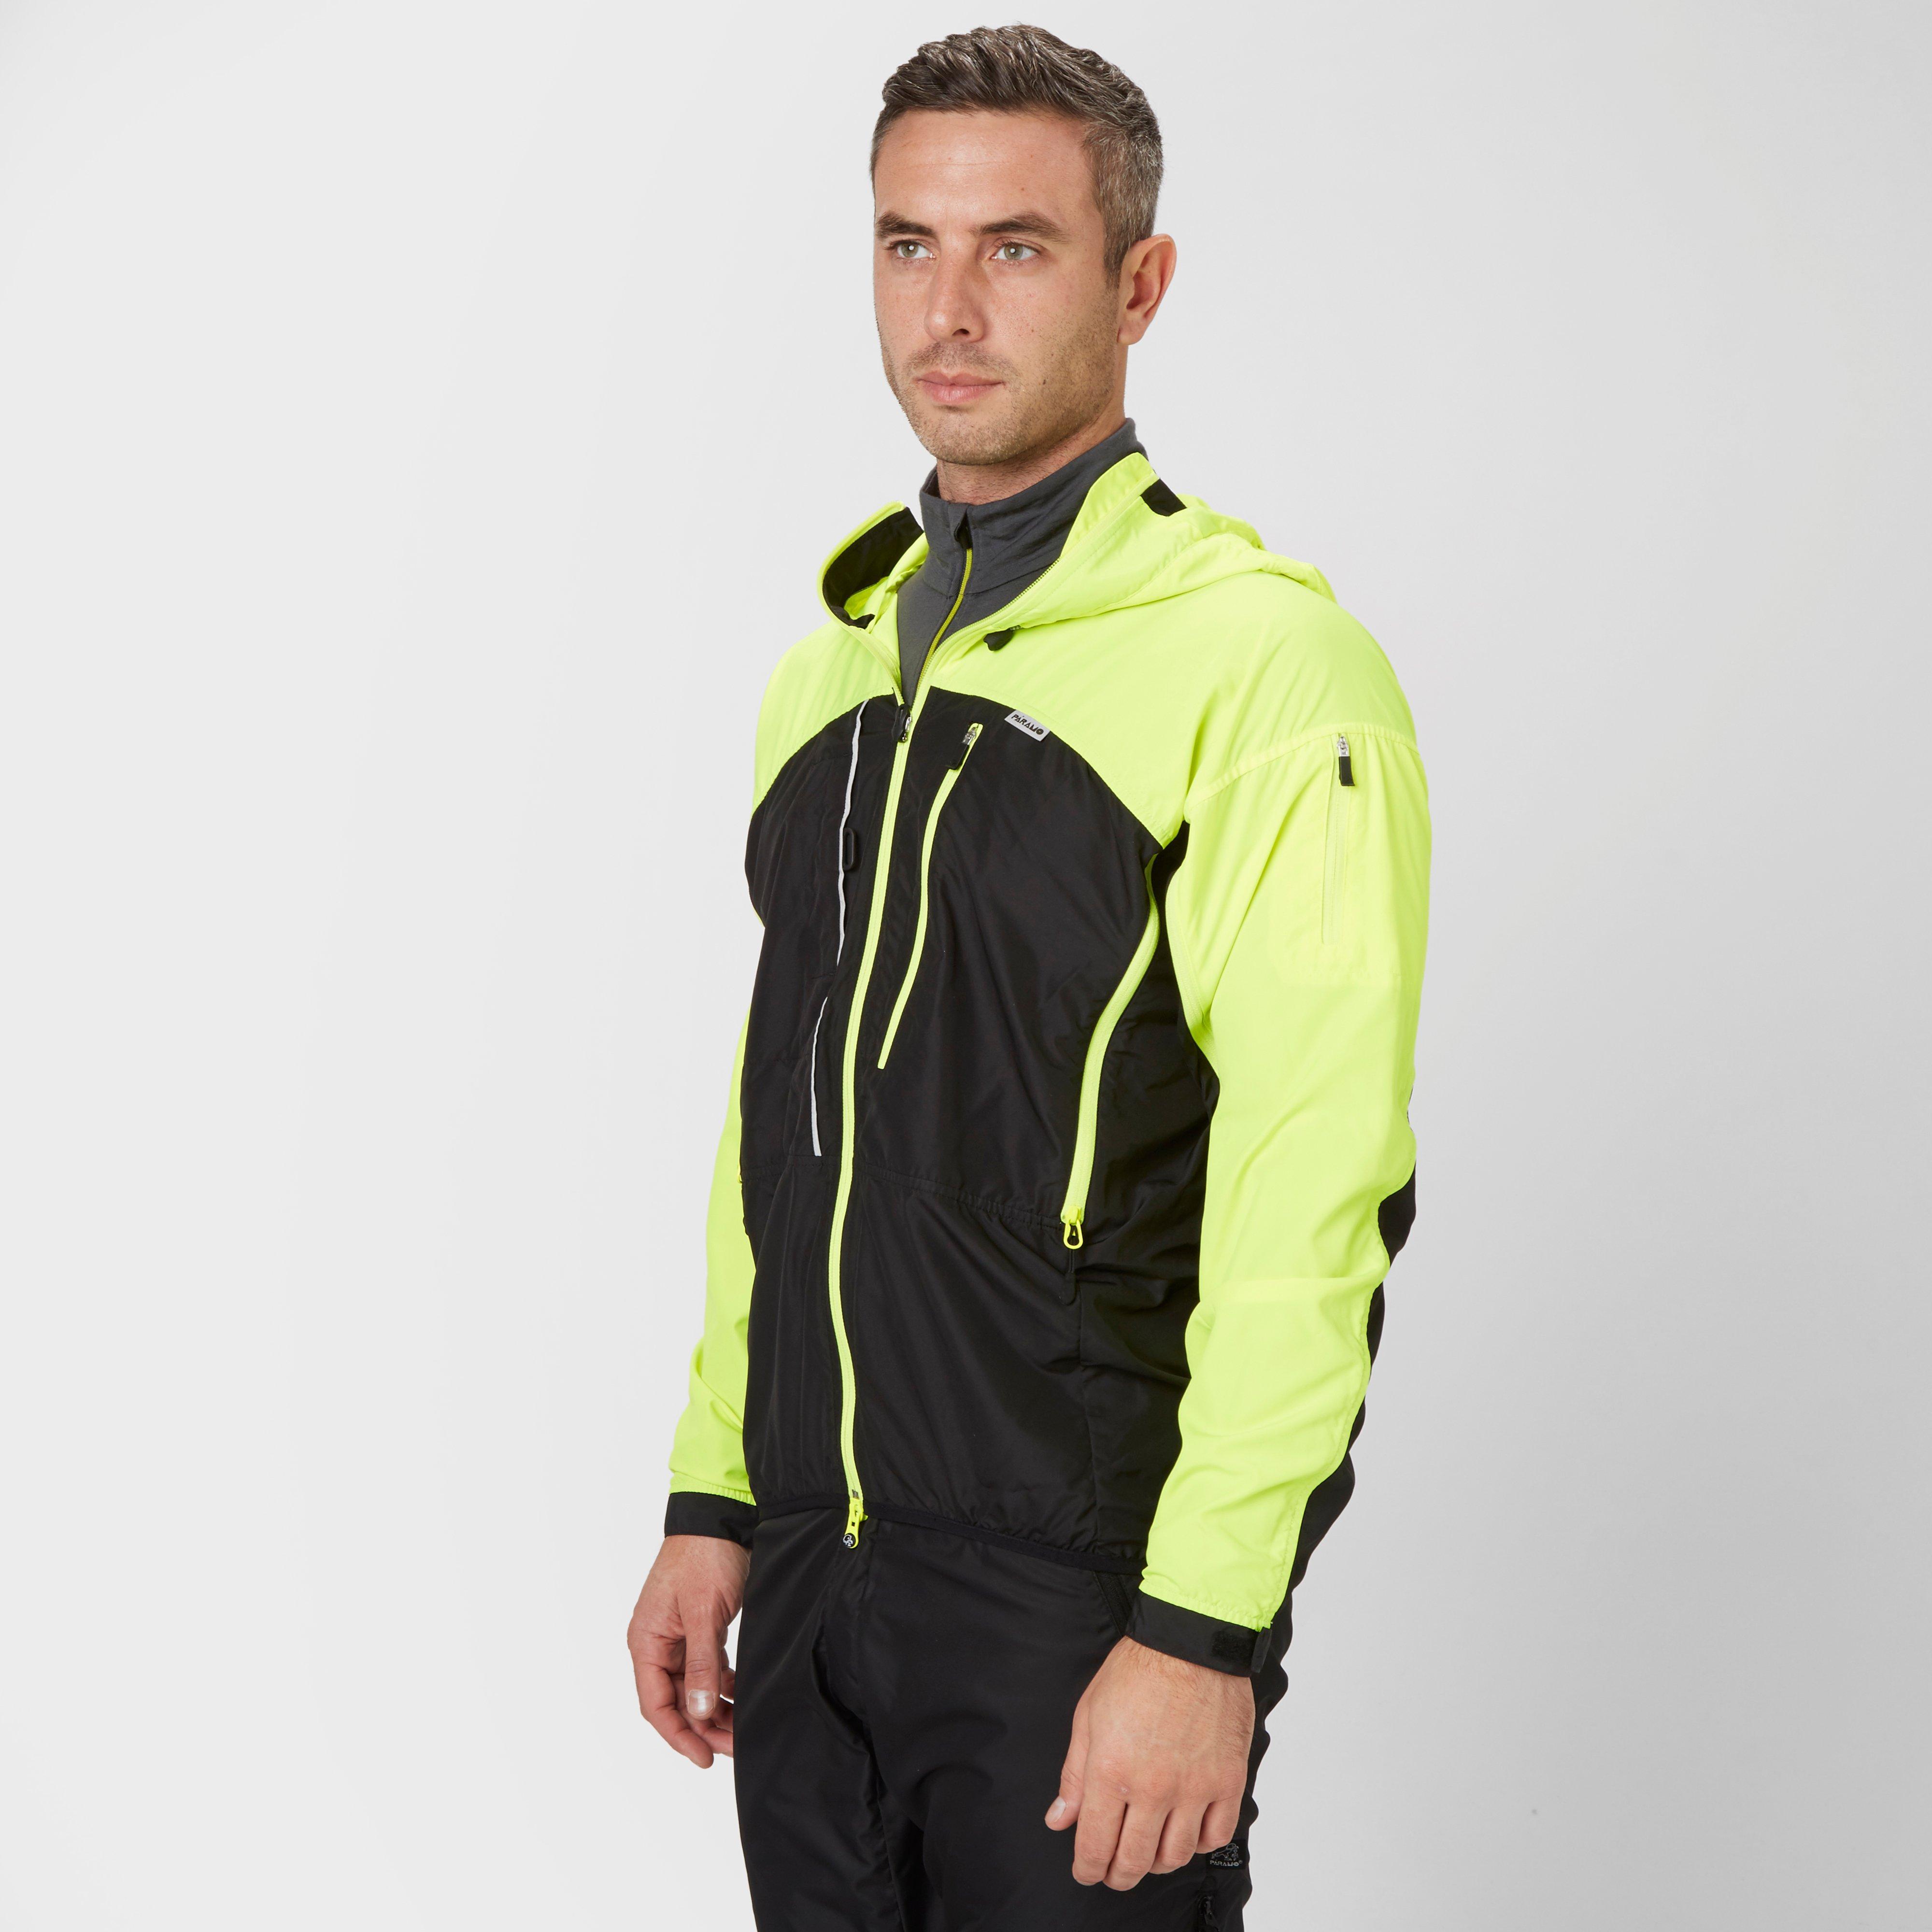 Men's enduro jacket - Men's Enduro Jacket 33